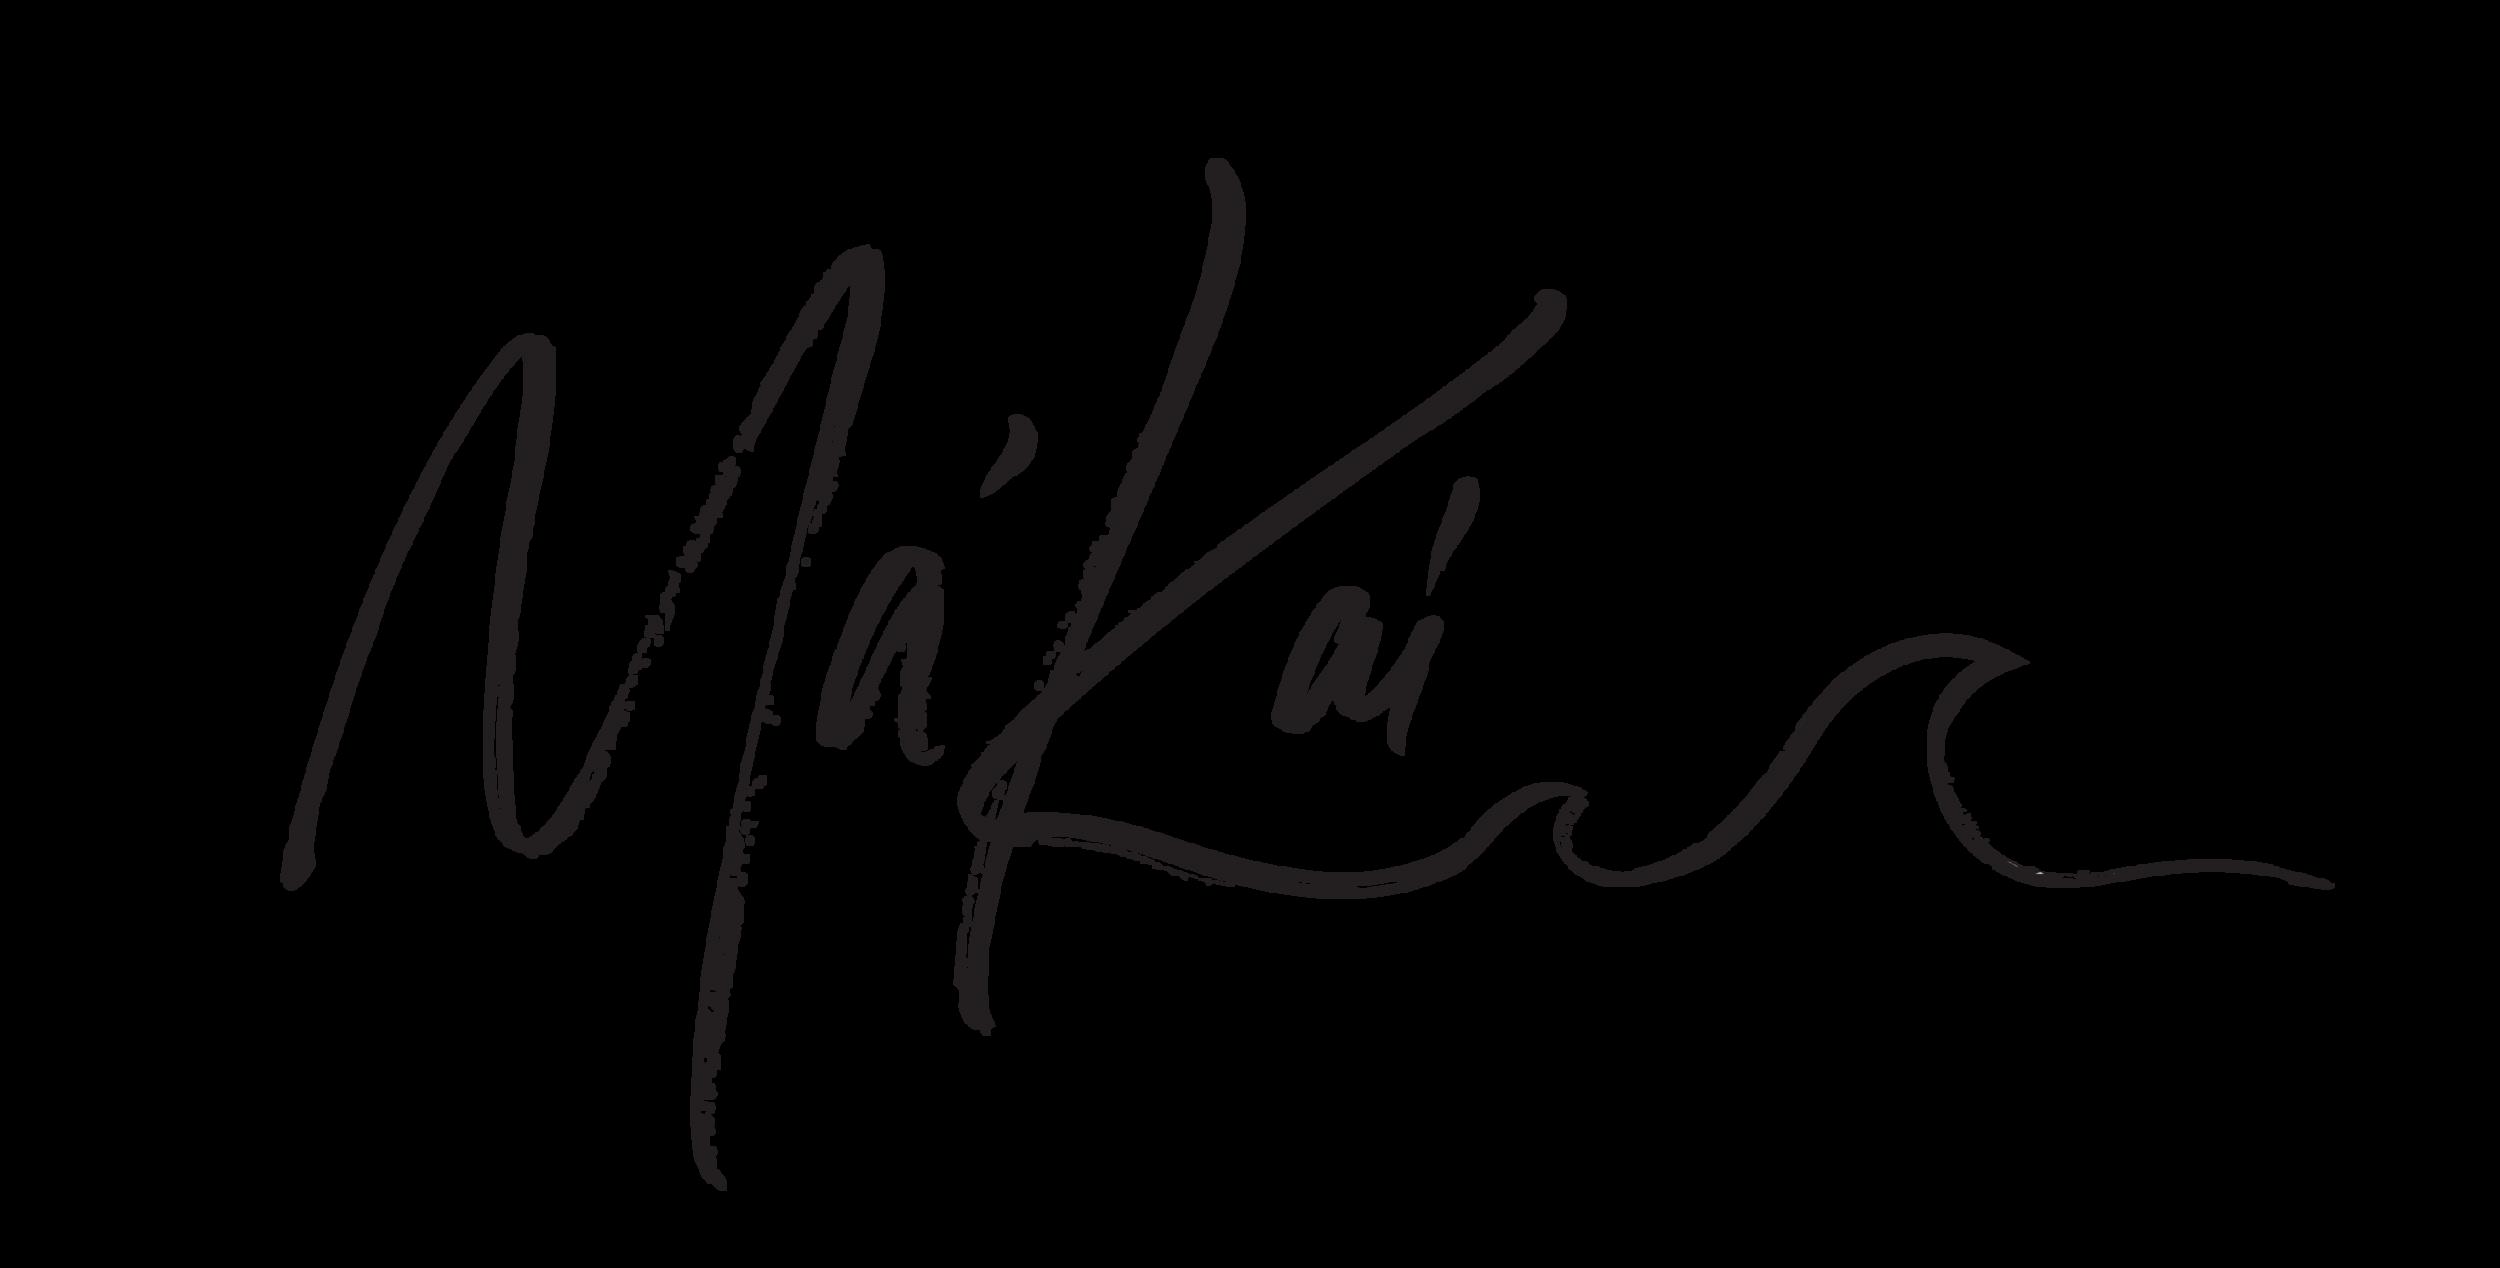 MaKai-logo.png